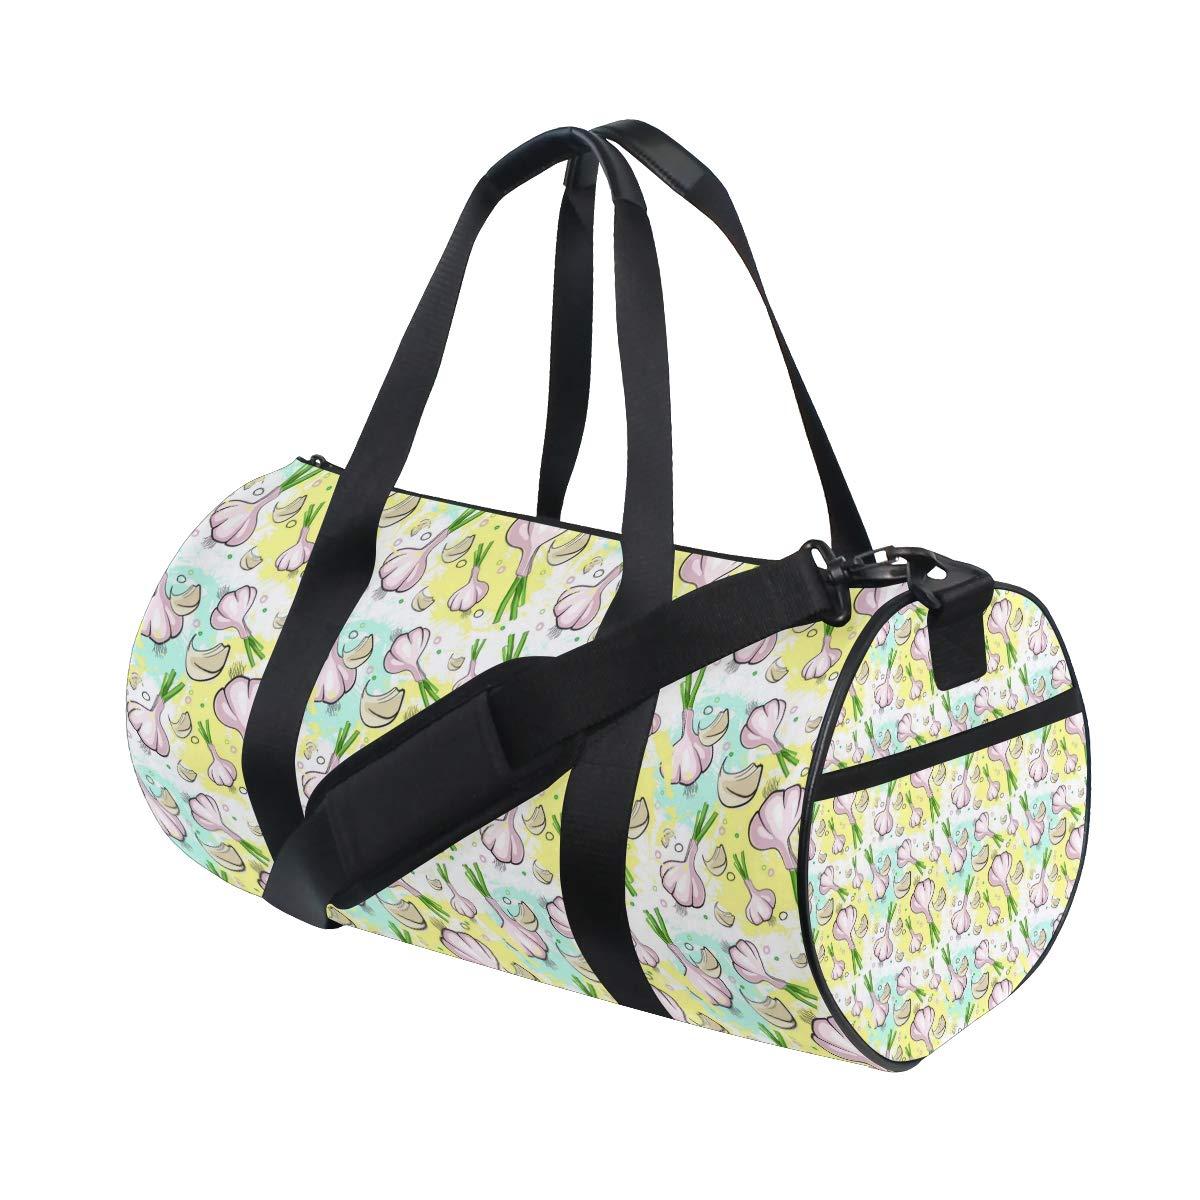 Waterproof Non-Slip Wearable Crossbody Bag fitness bag Shoulder Bag Dried Vegetable Picture